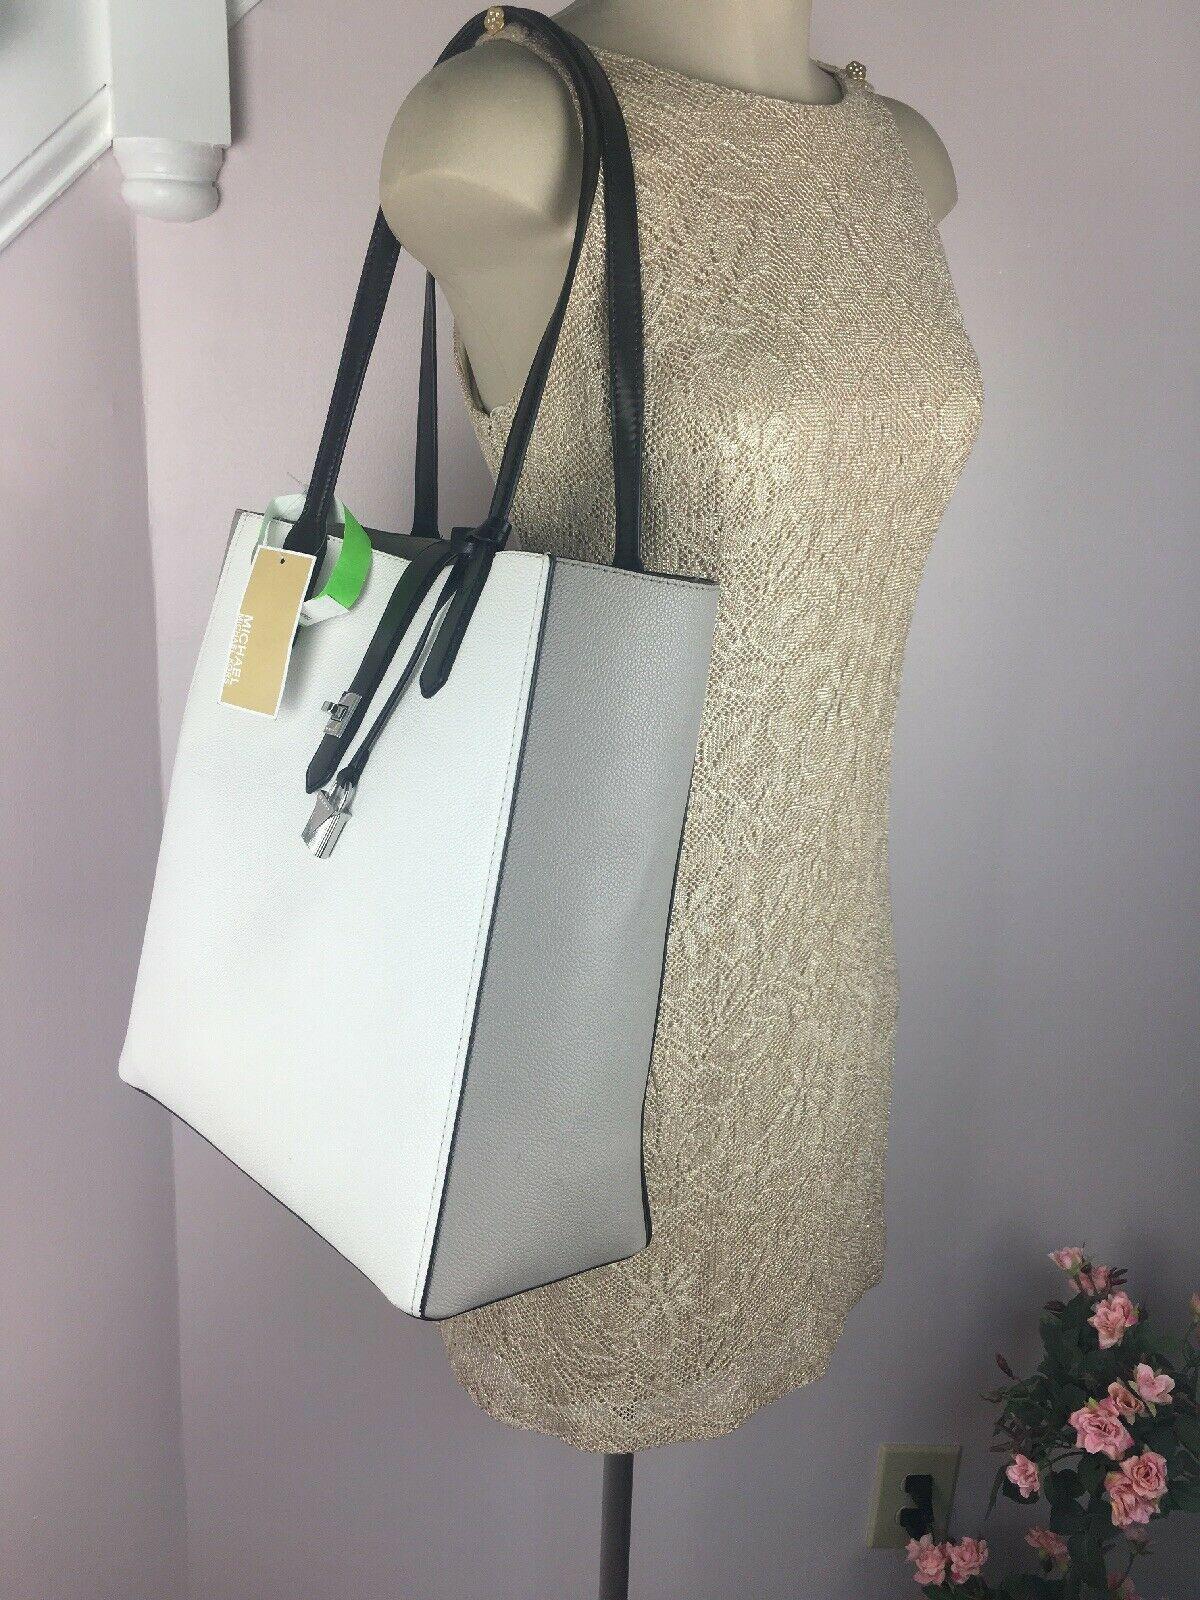 Michael Kors Bag Cassie Tote Medium NS Tote Leather White Gray Black B2R image 4